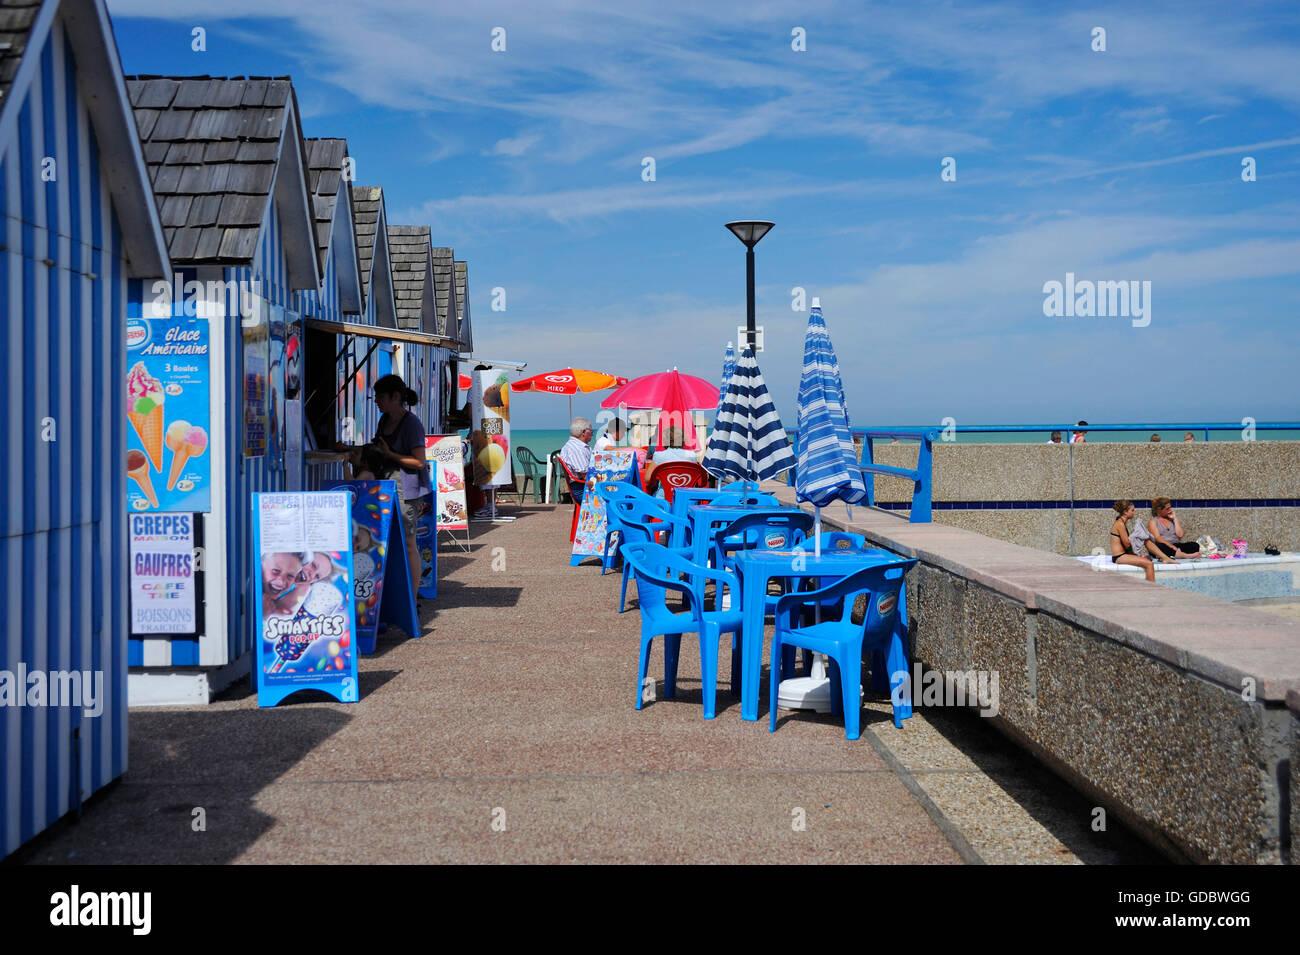 Beach, Kiosk, St-Valery-en-Caux, Normandy, France - Stock Image